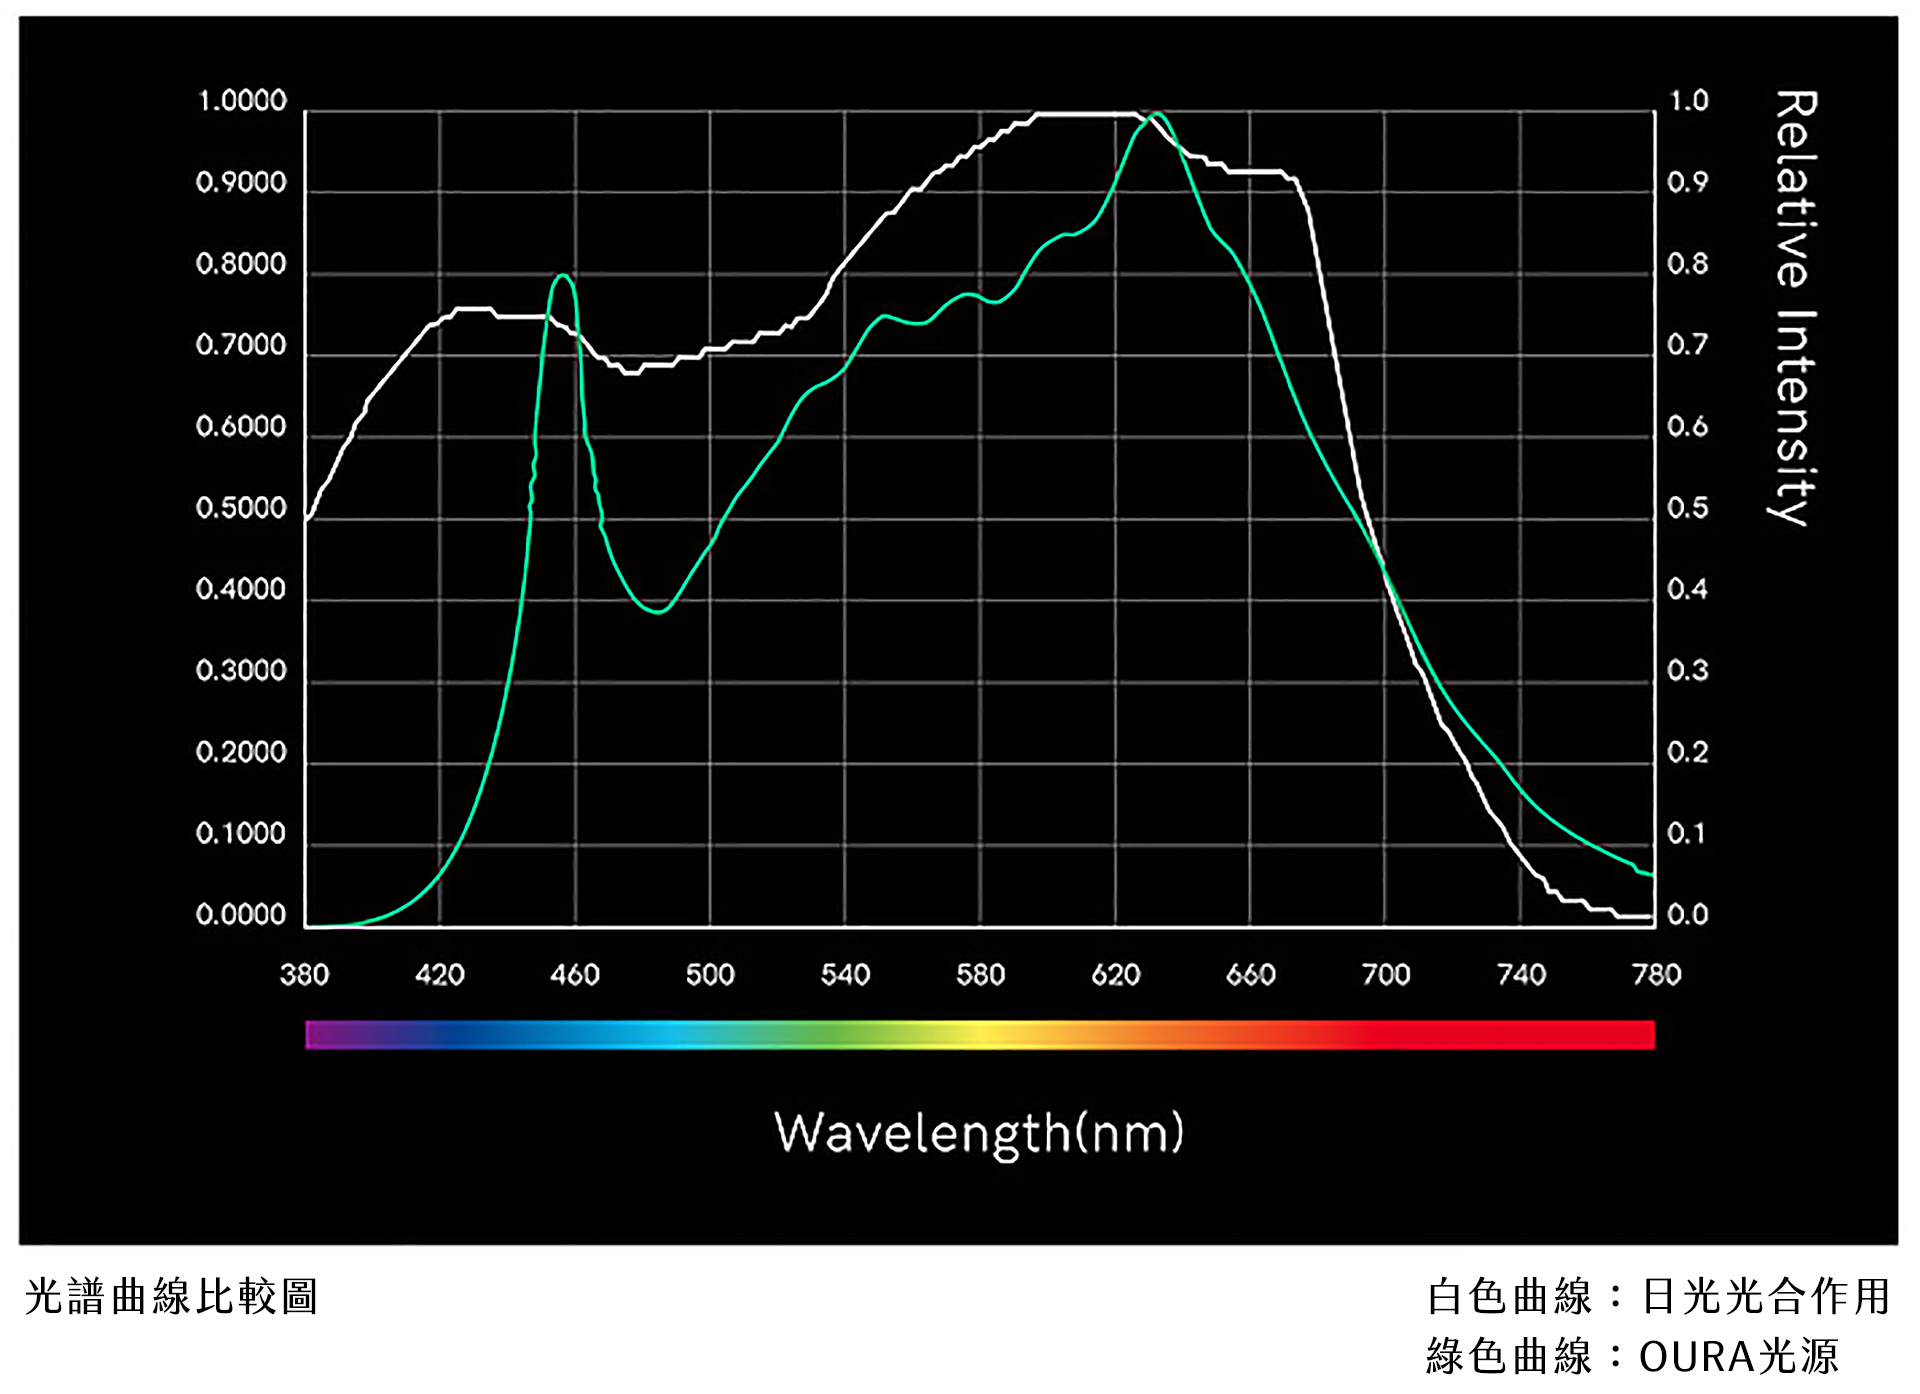 OURA 光譜表呈現